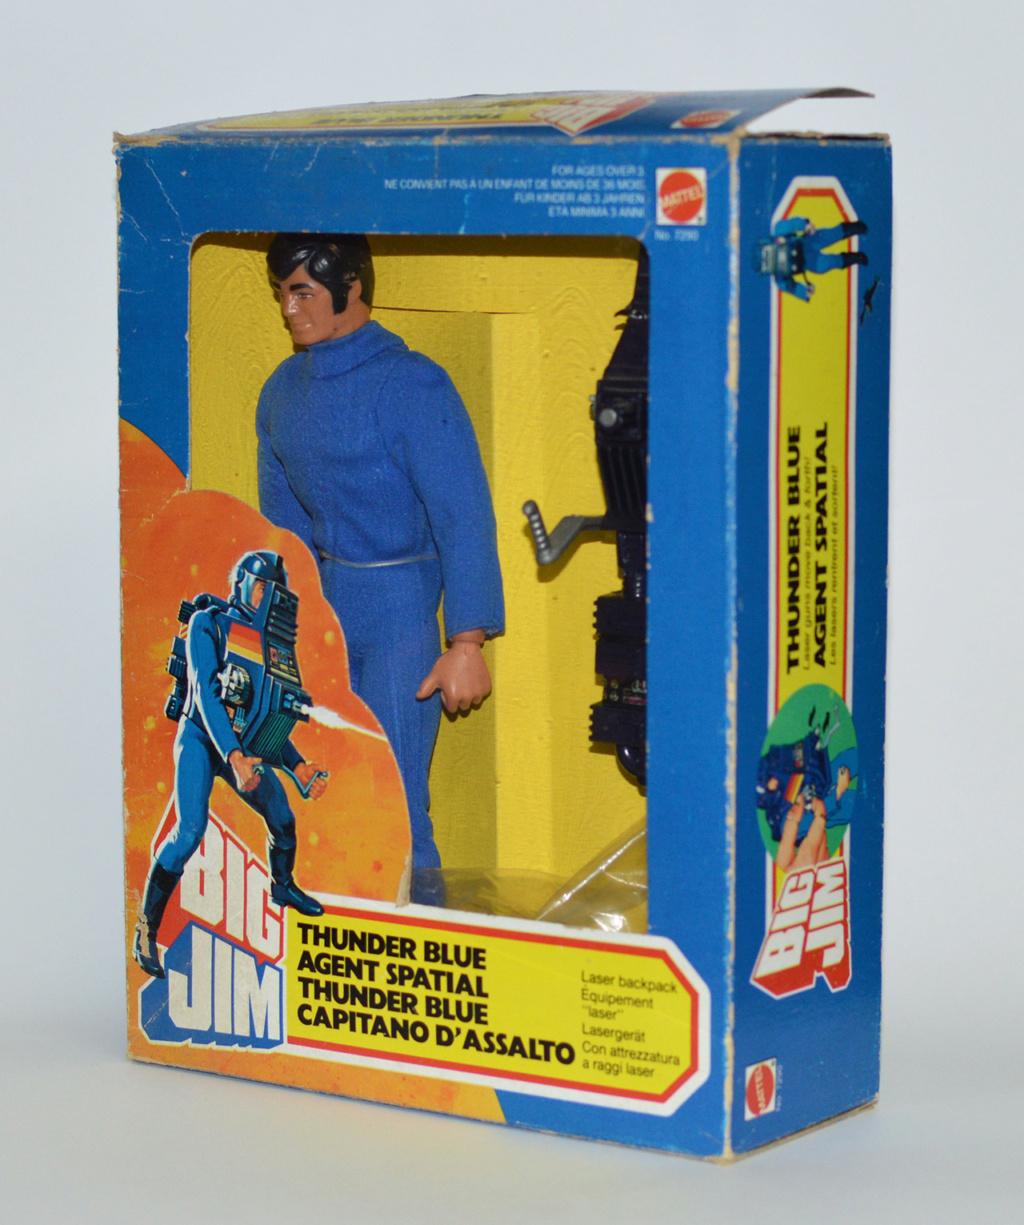 SCHEDA DI: THUNDER BLUE N°7290/ANNO 1984 Box11